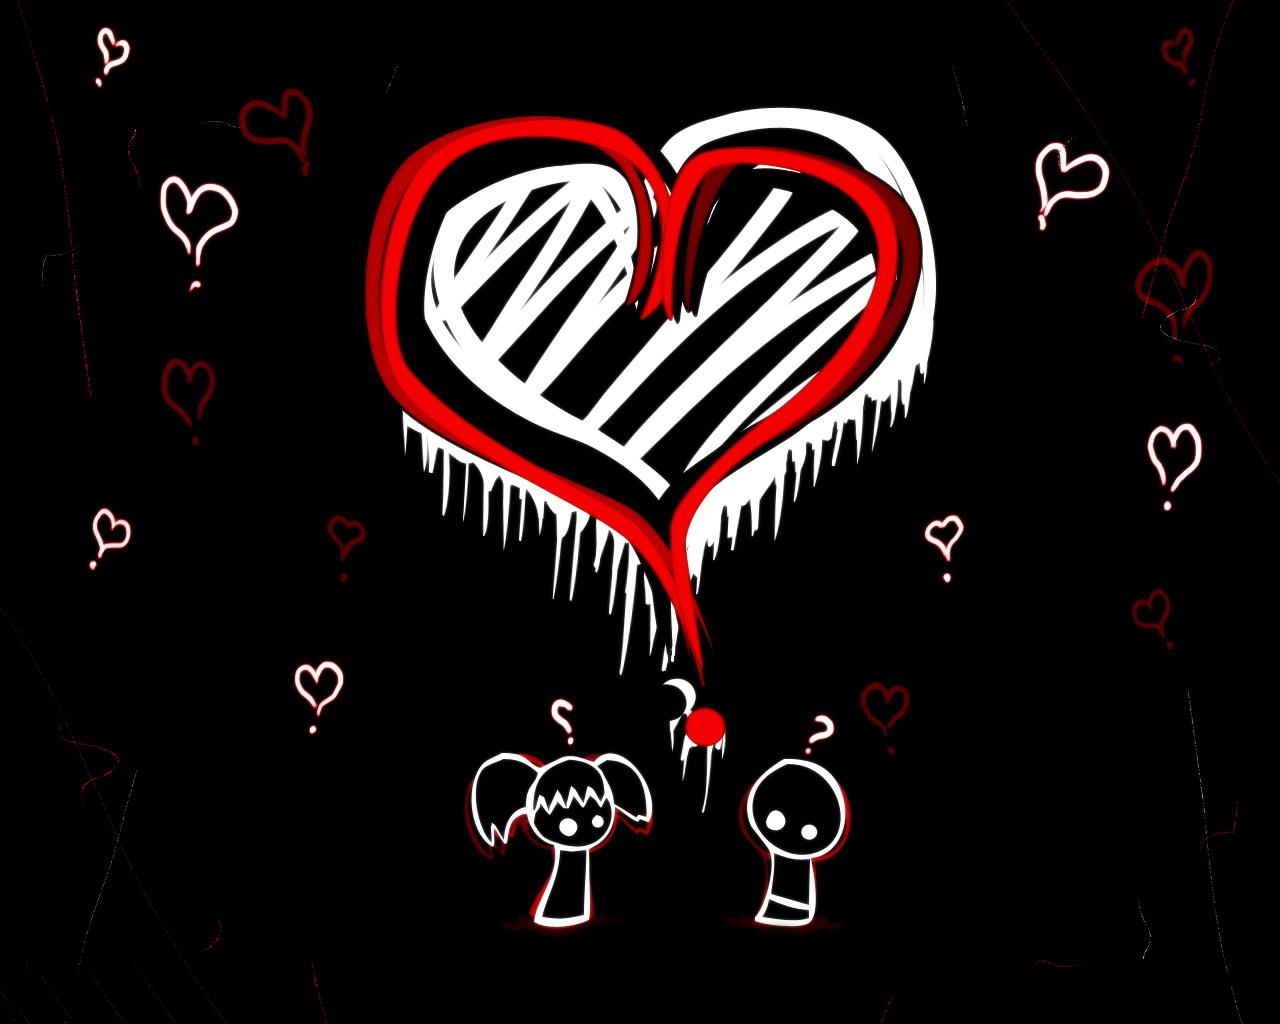 http://4.bp.blogspot.com/_-dtjO8zBUTk/S6zP6gvPVoI/AAAAAAAAACU/BkE4qlyHv8U/s1600/Emo_Emo_style_005152_-322400.jpeg